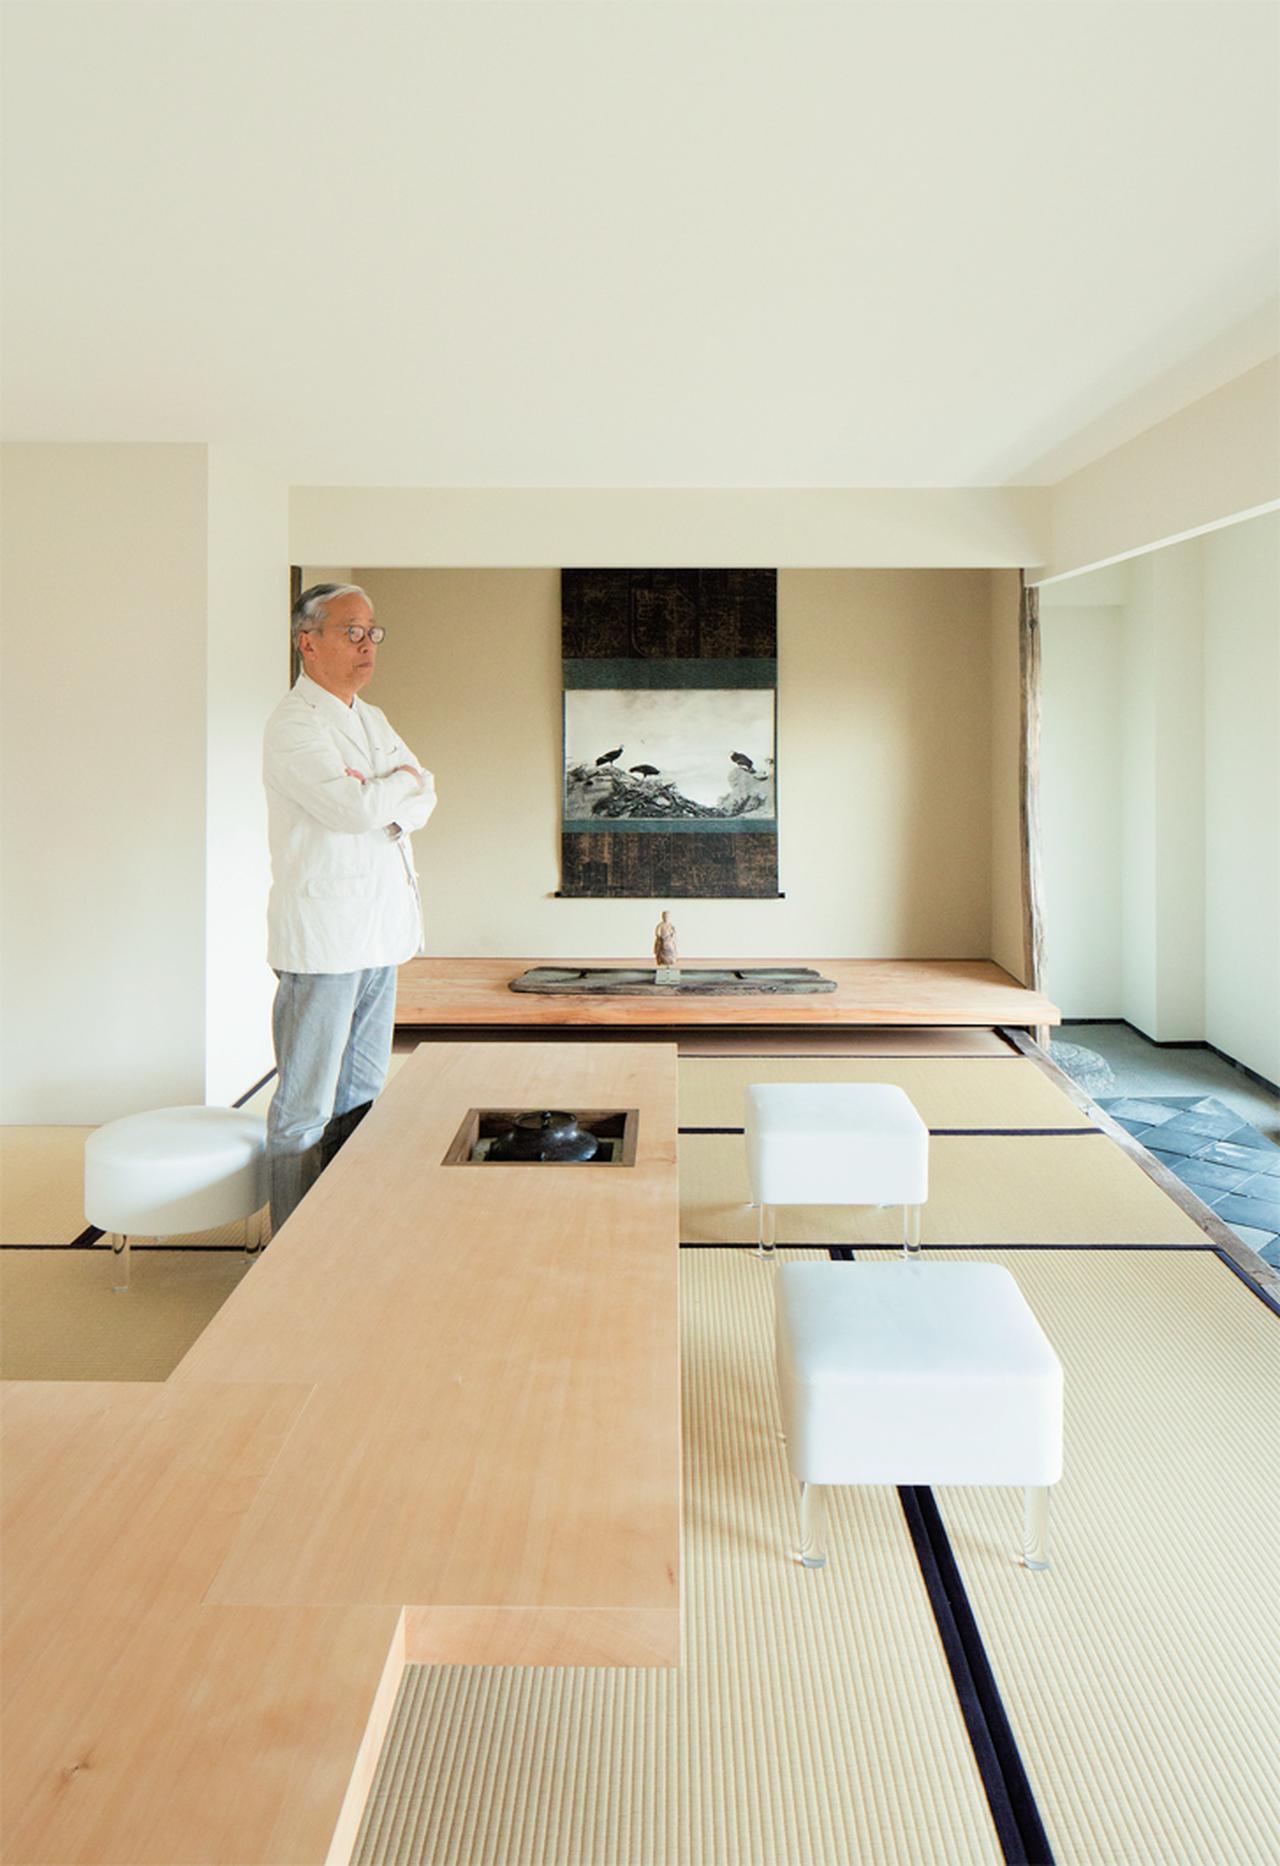 Images : 9番目の画像 - 「時と向き合うアーティスト、 杉本博司」のアルバム - T JAPAN:The New York Times Style Magazine 公式サイト